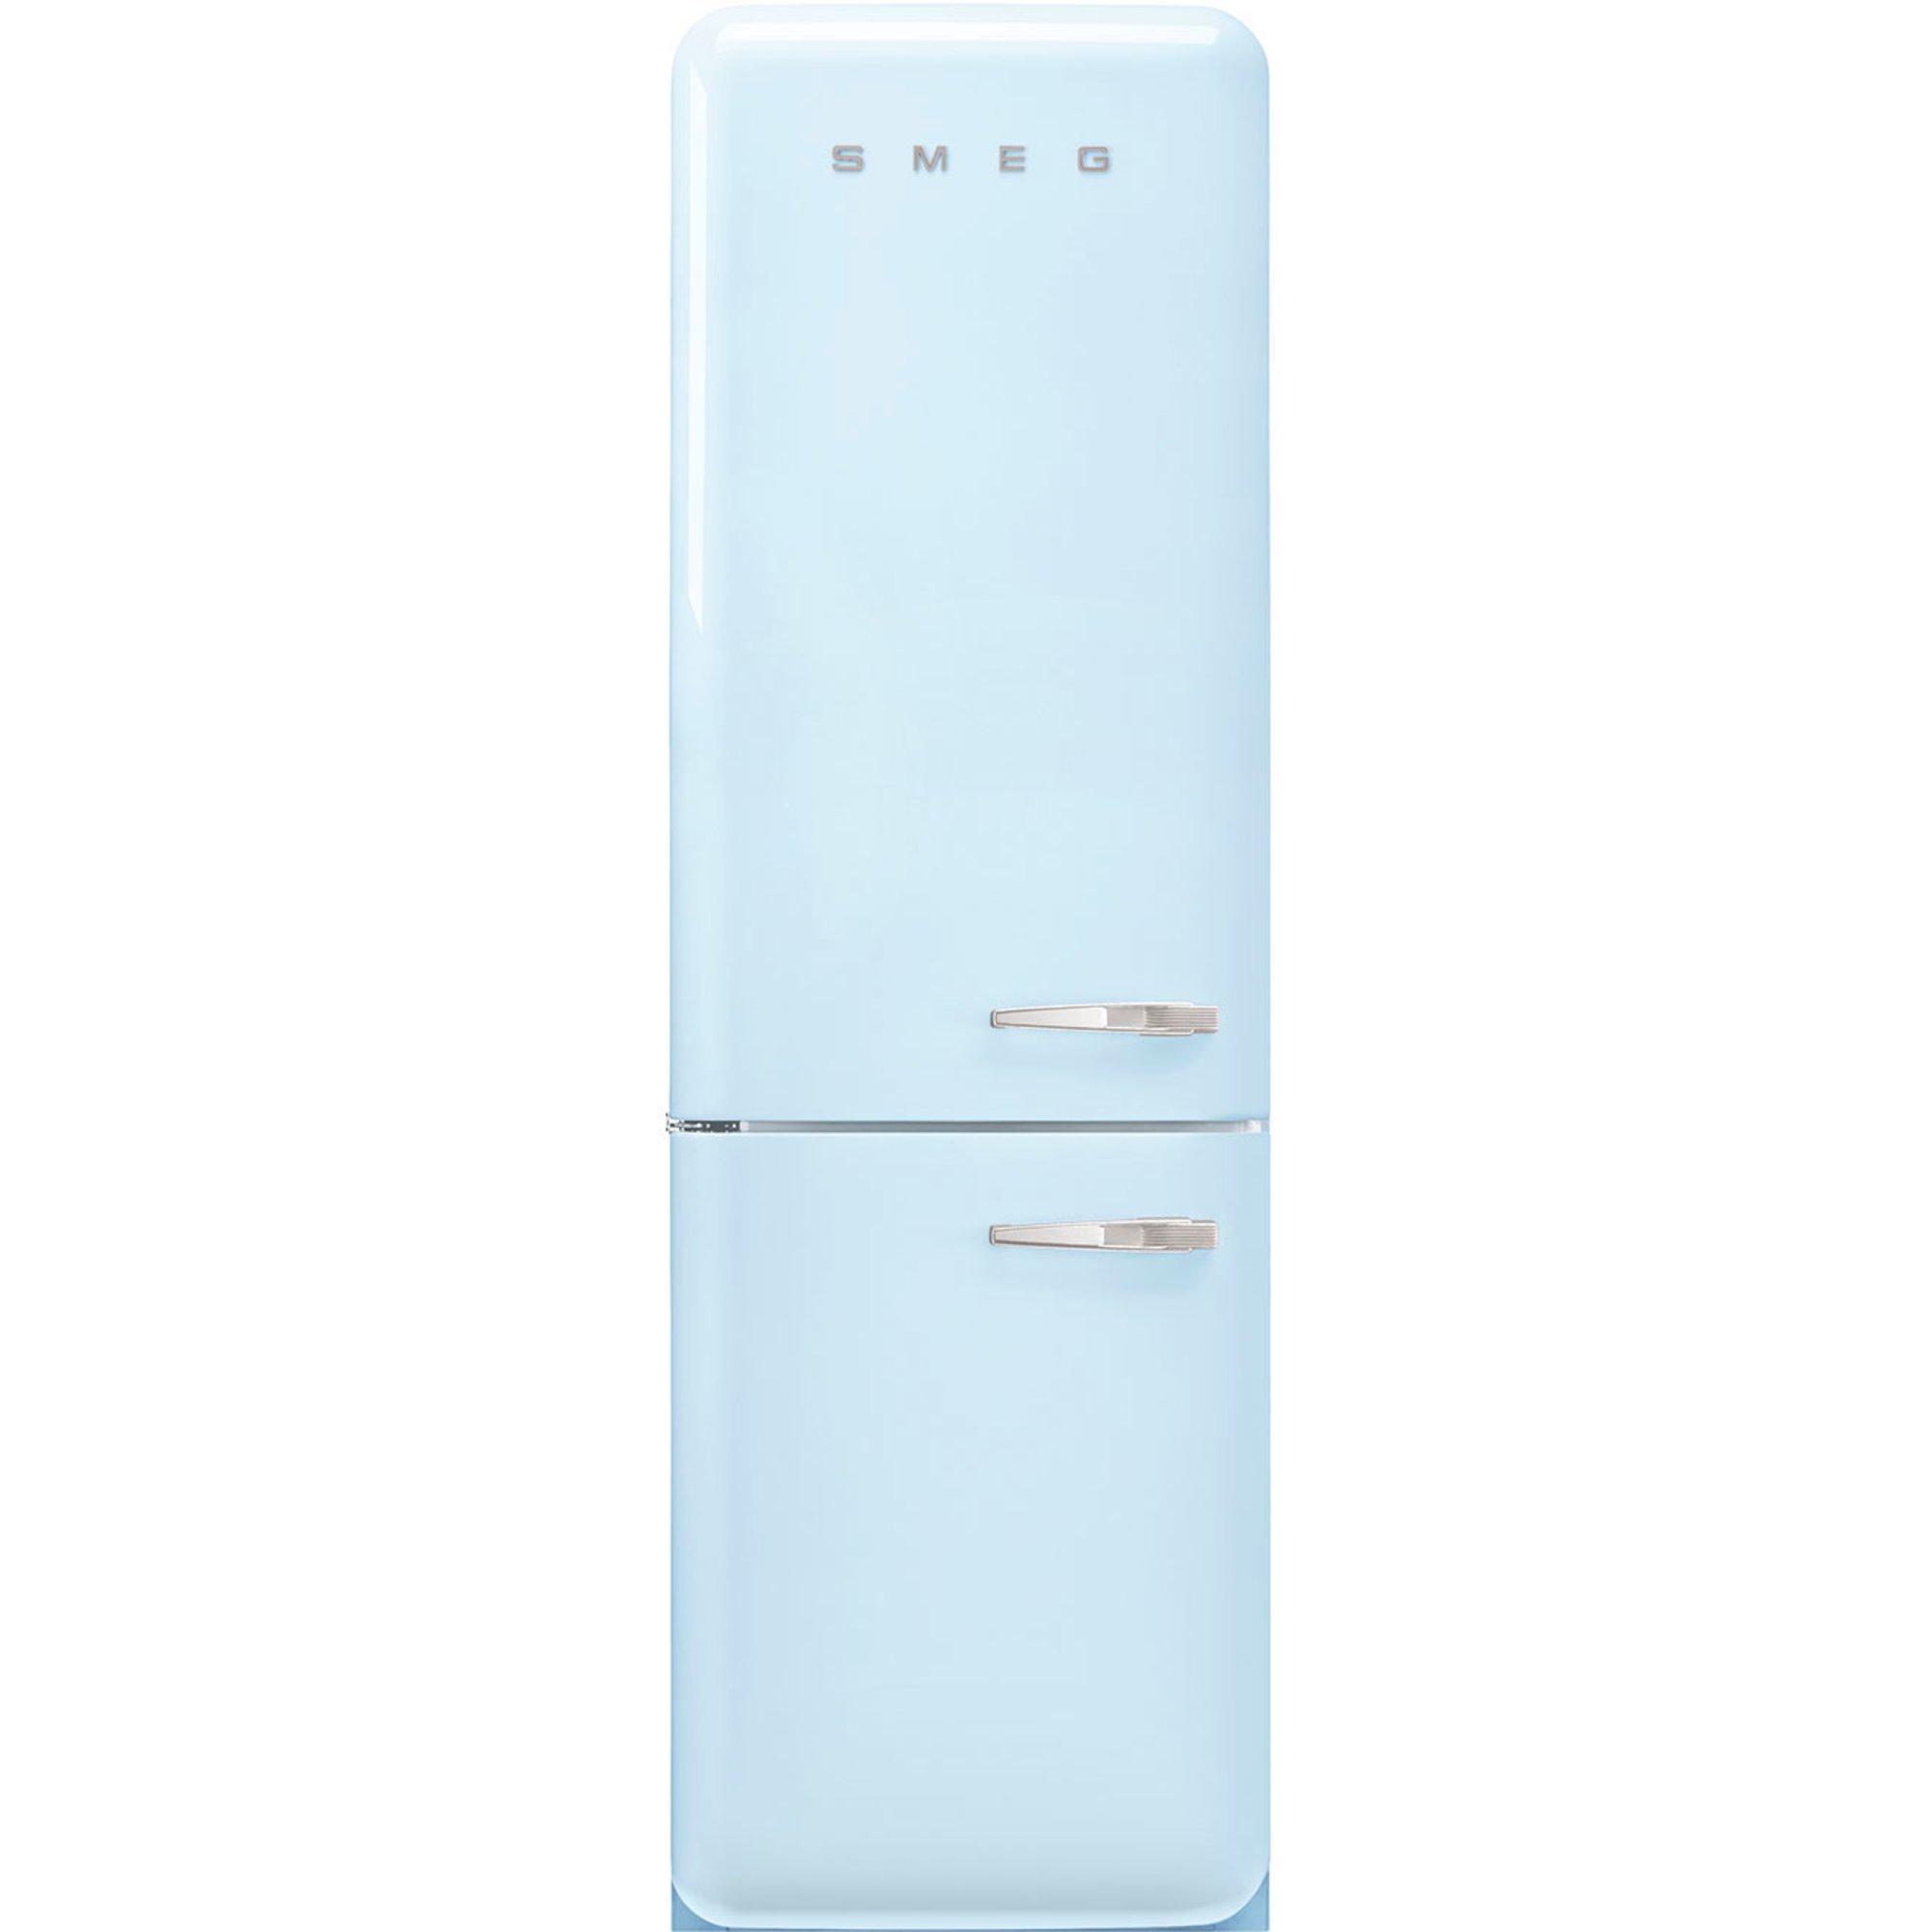 Smeg FAB32LPB5 Køle-/fryseskab pastelblå